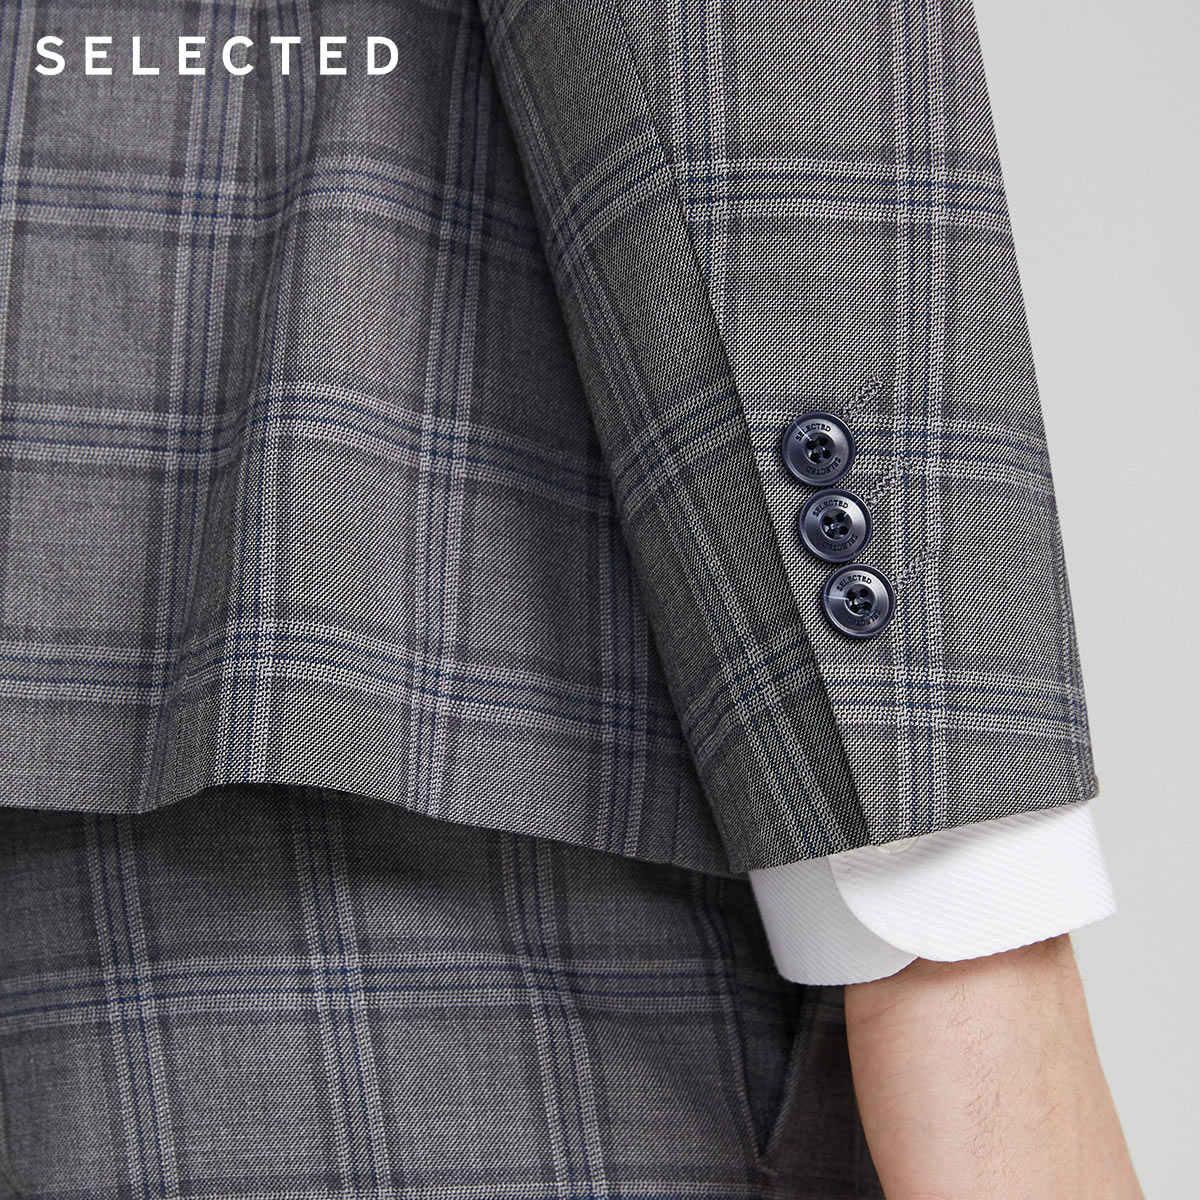 SELECTED 남성 캐주얼 자켓 격자 무늬 무늬 블레이저 S   42015X509